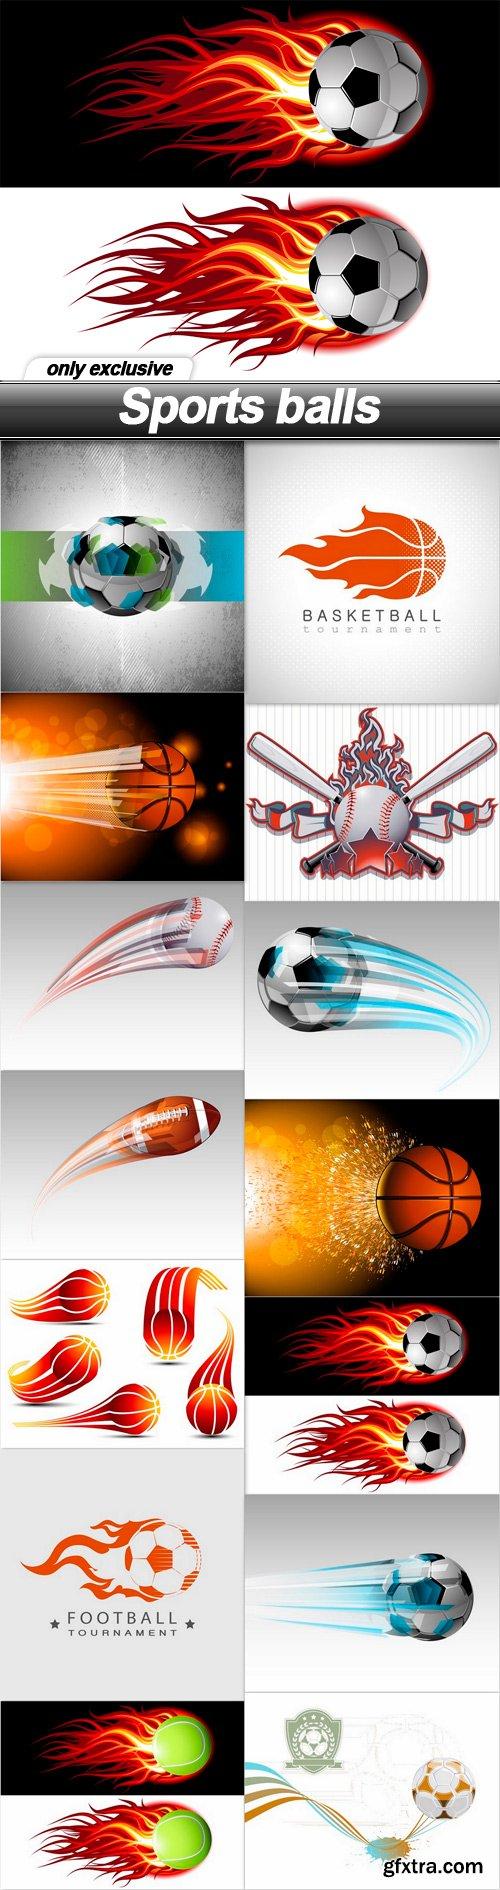 Sports balls - 14 EPS